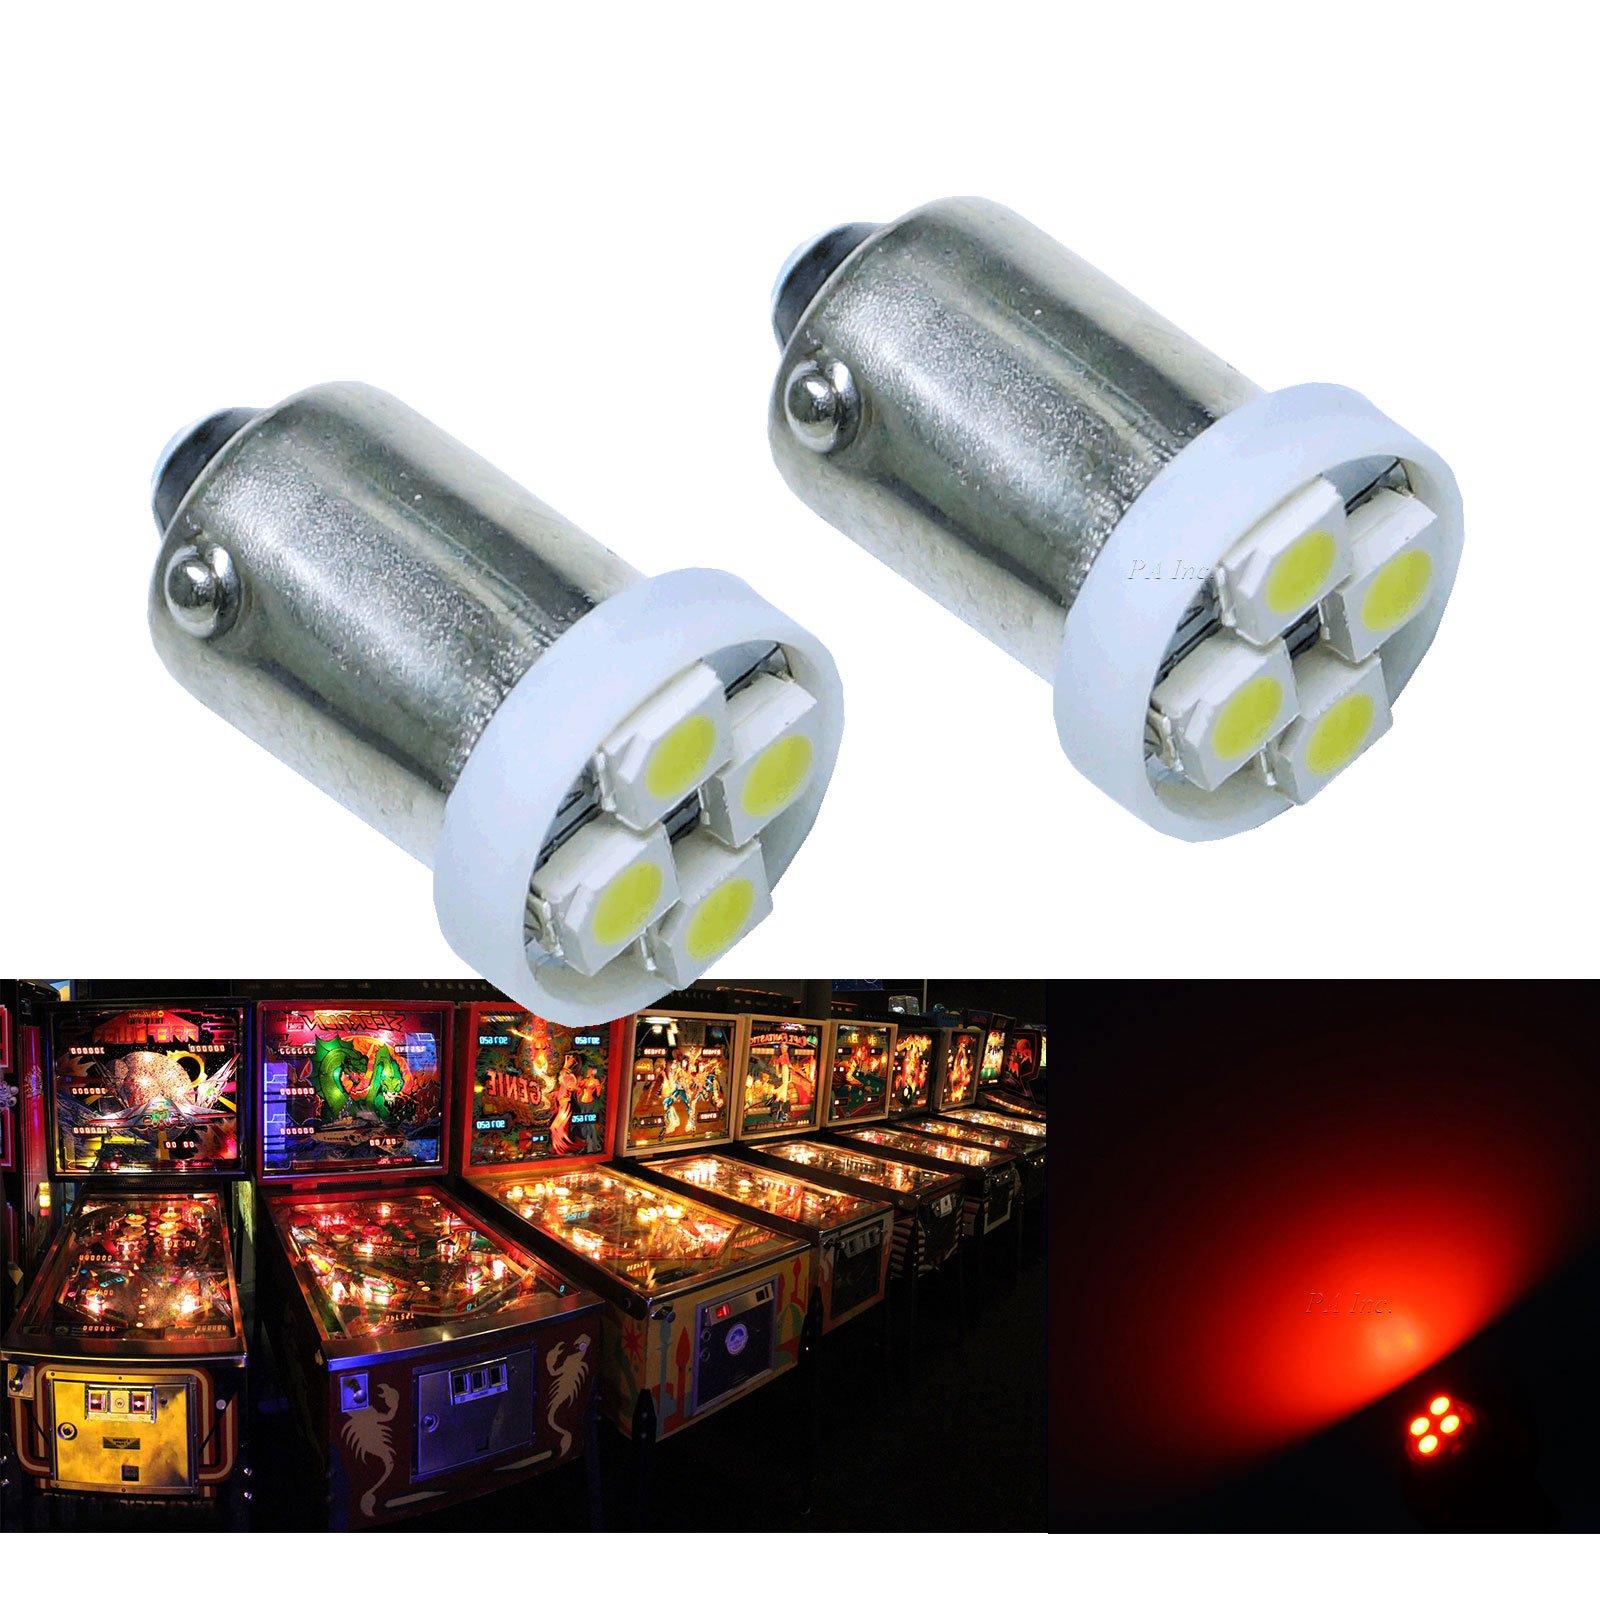 PA 10PCS #1893 #44 #47 #756 #1847 BA9S 4SMD LED Wedge Pinball Machine Light Bulb Red-6.3V